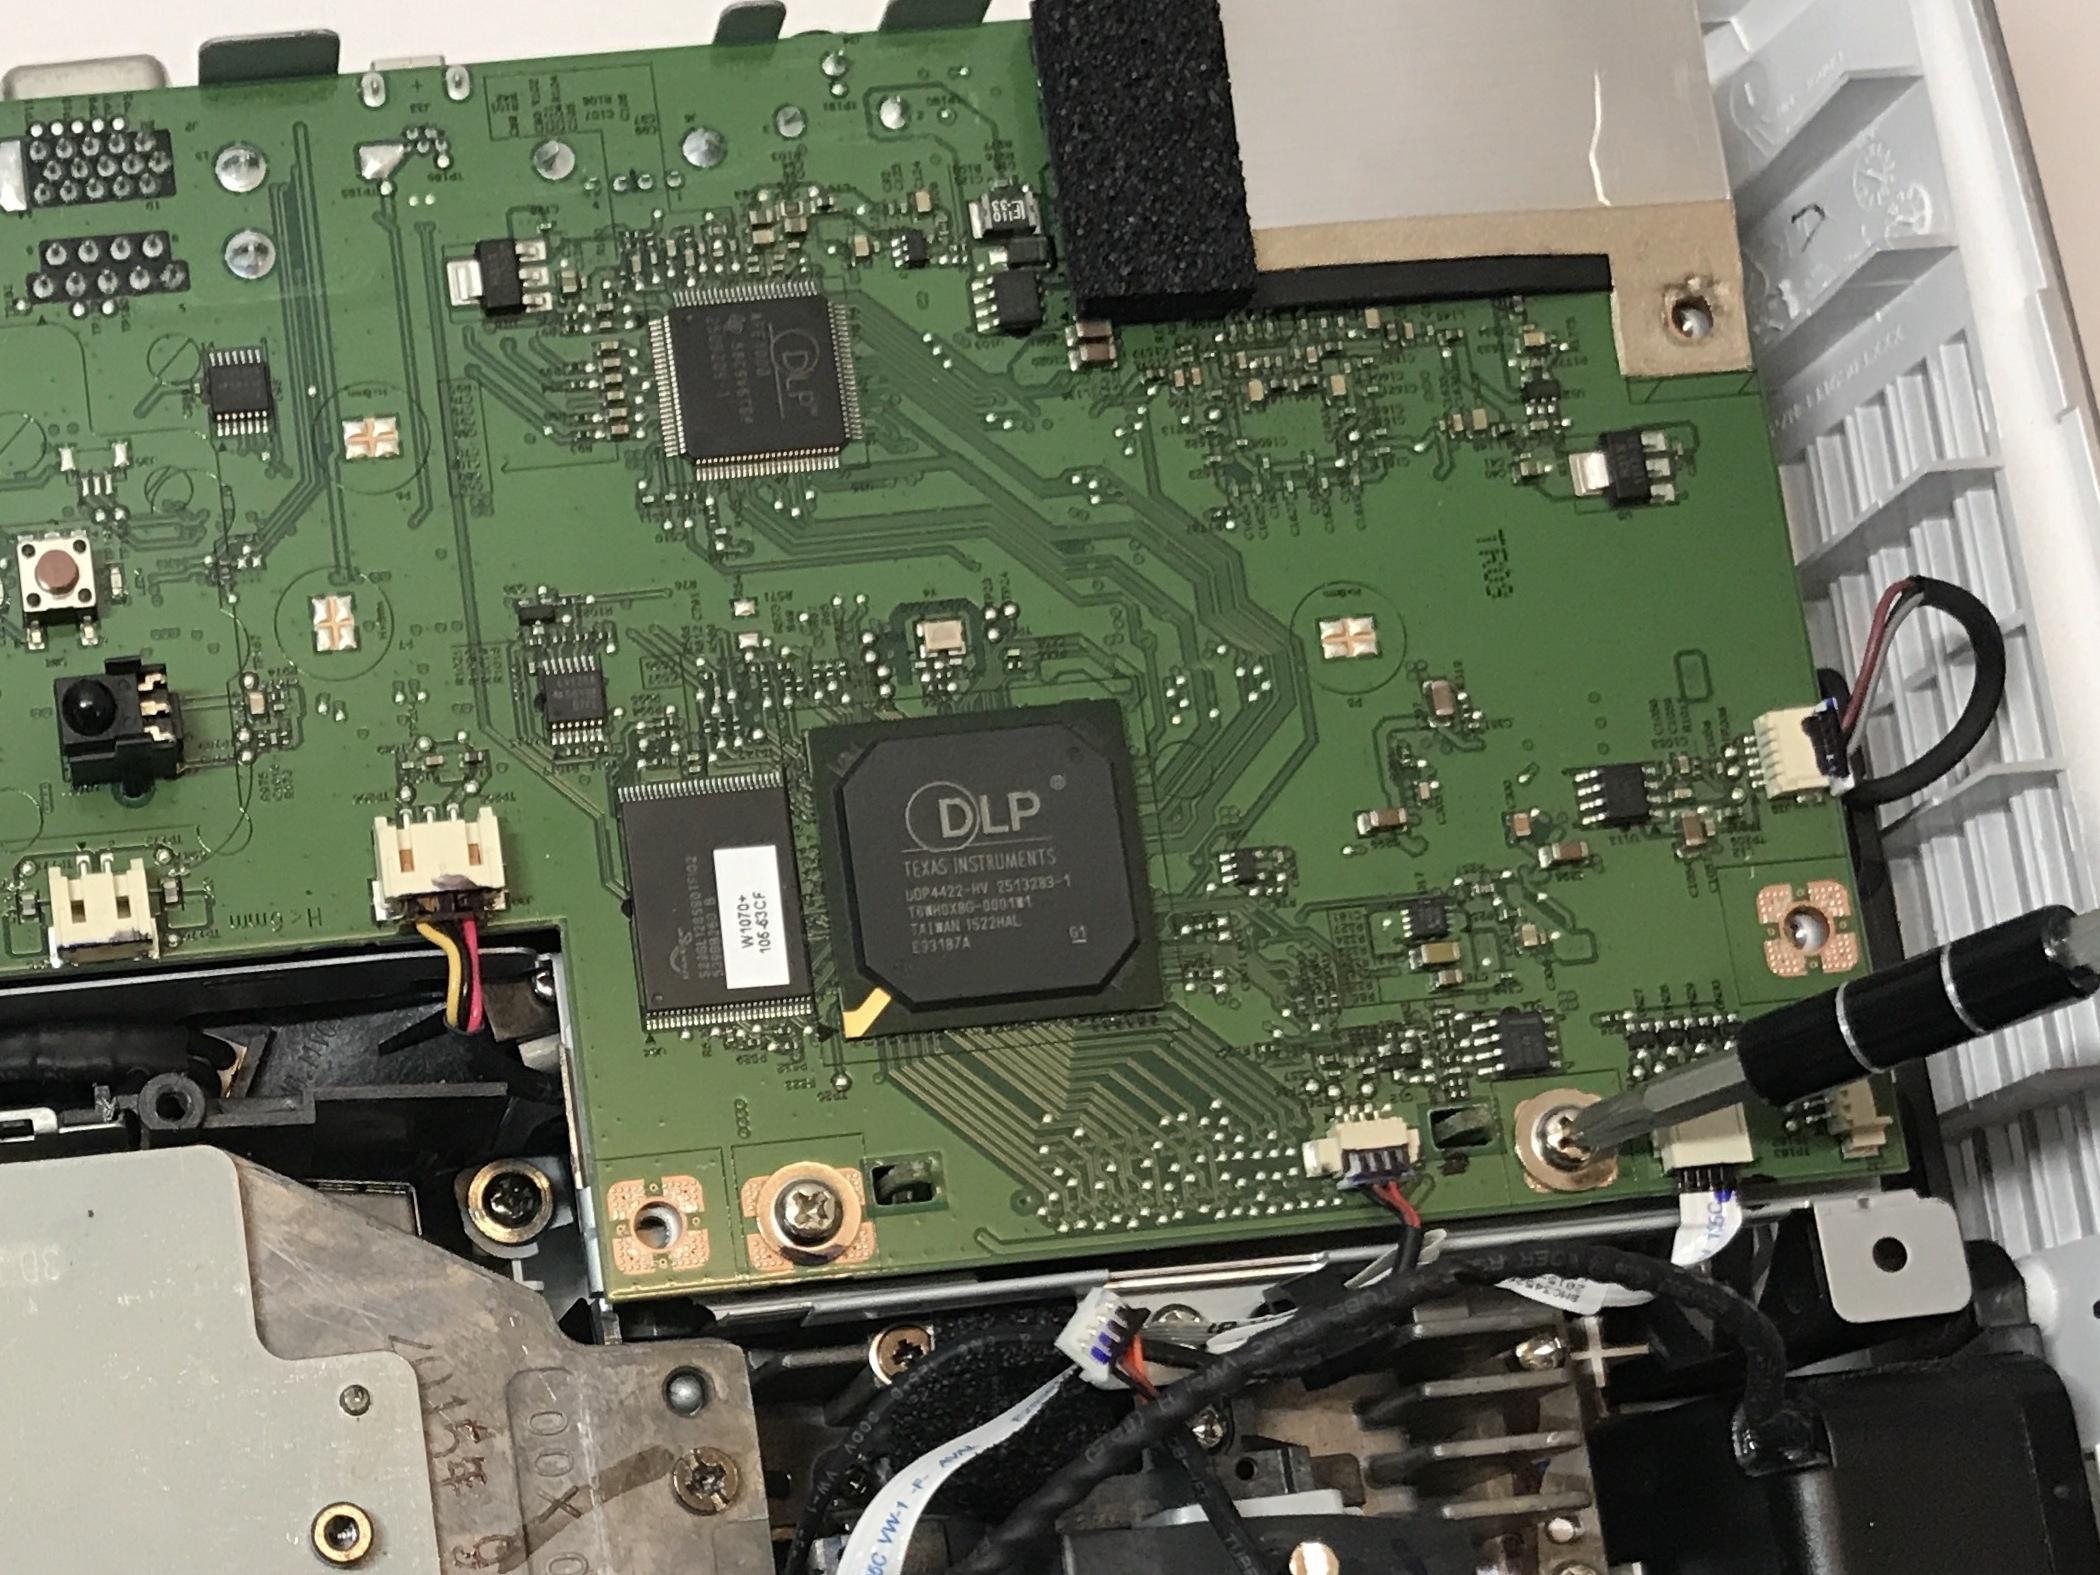 Benq Ht1075 Projector Repair Ifixit Wiring Diagram Circuit Board